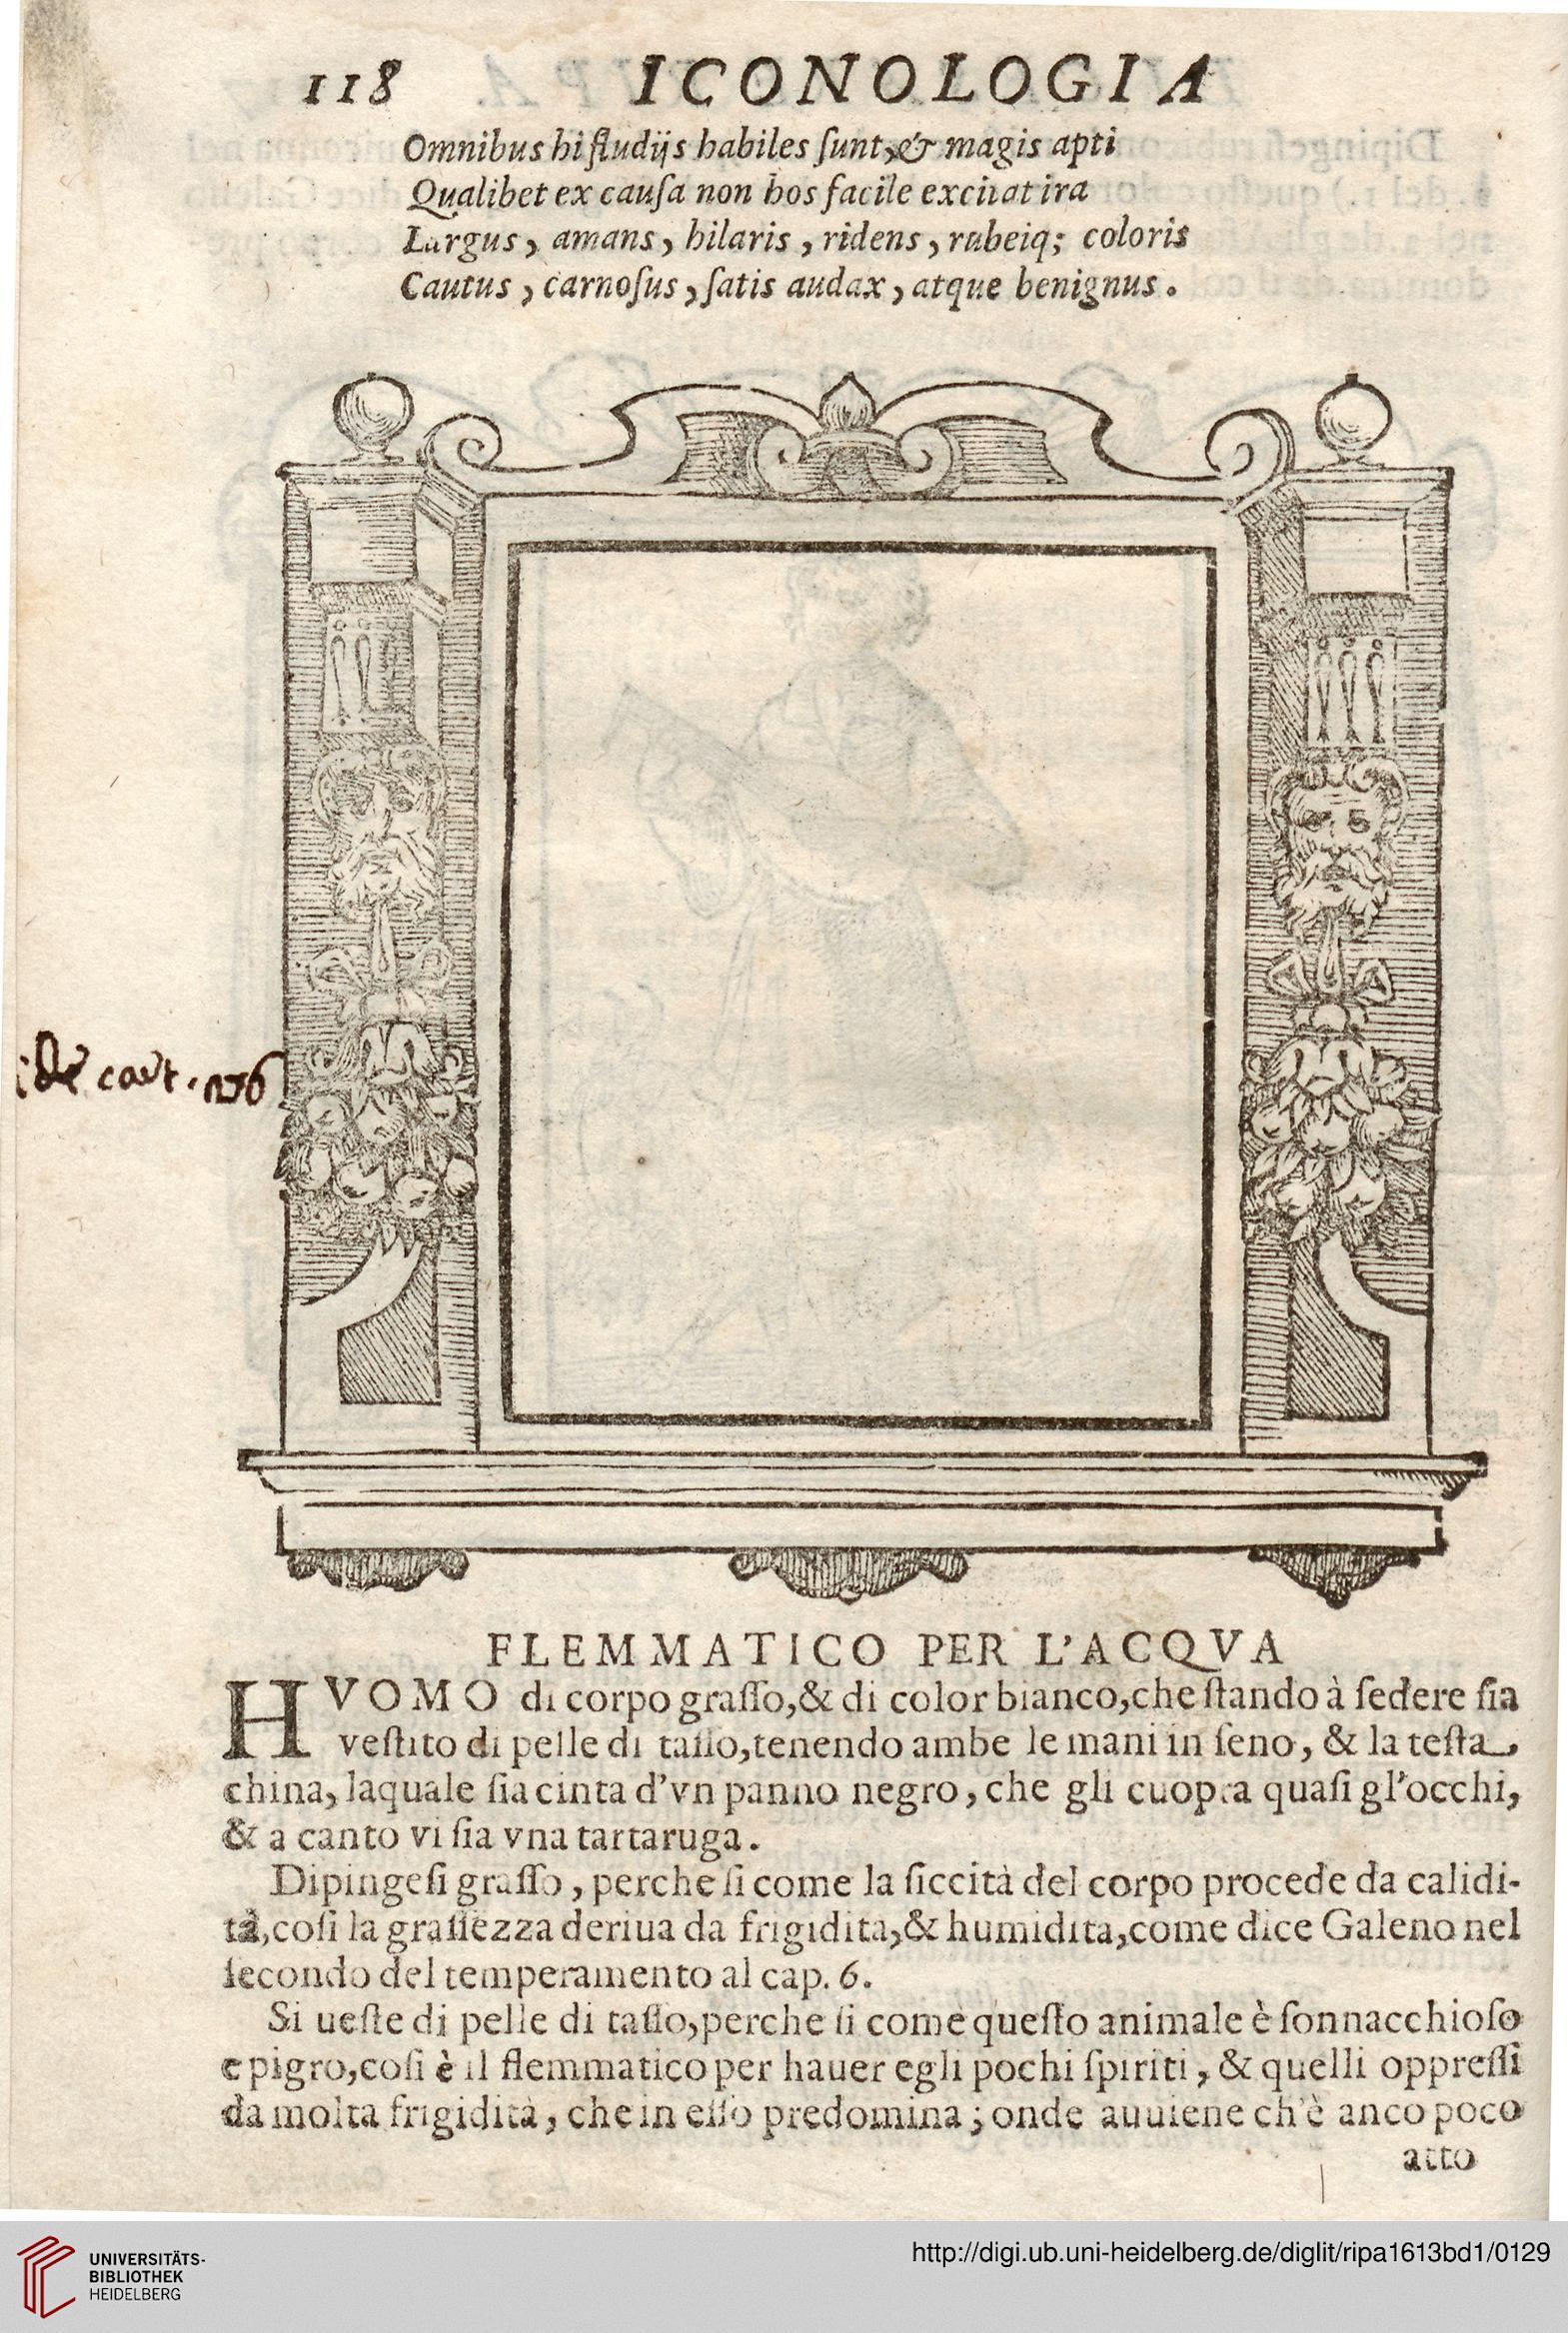 Maffesoli iconologias pdf to jpg